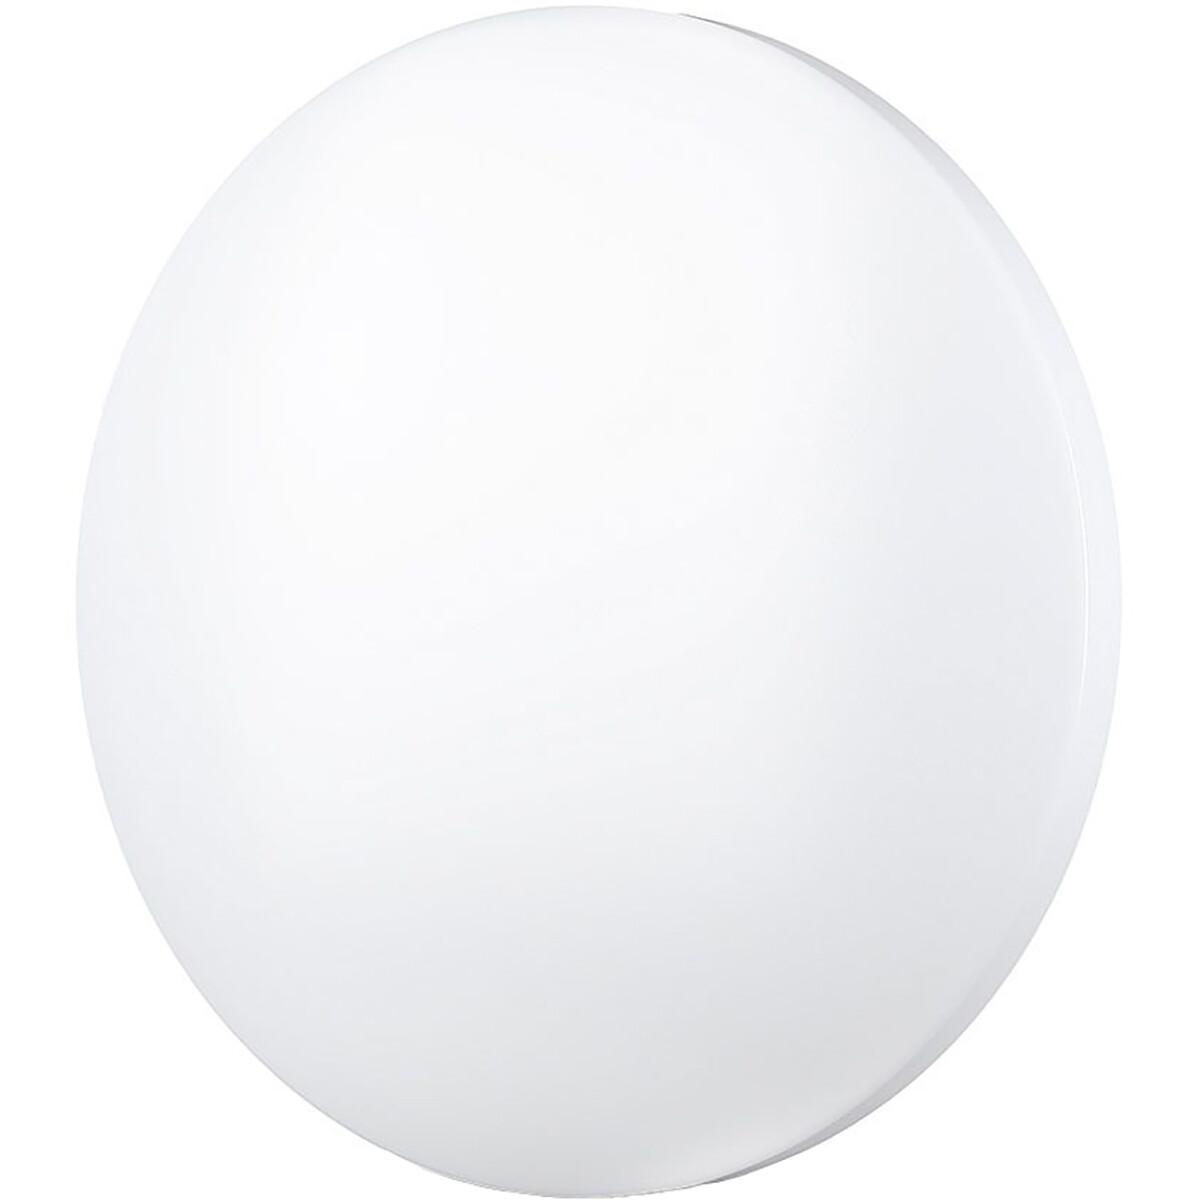 LED Plafondlamp - Viron Hasin - 36W - Inbouw Rond - Aanpasbare Kleur - Mat Wit - Kunststof